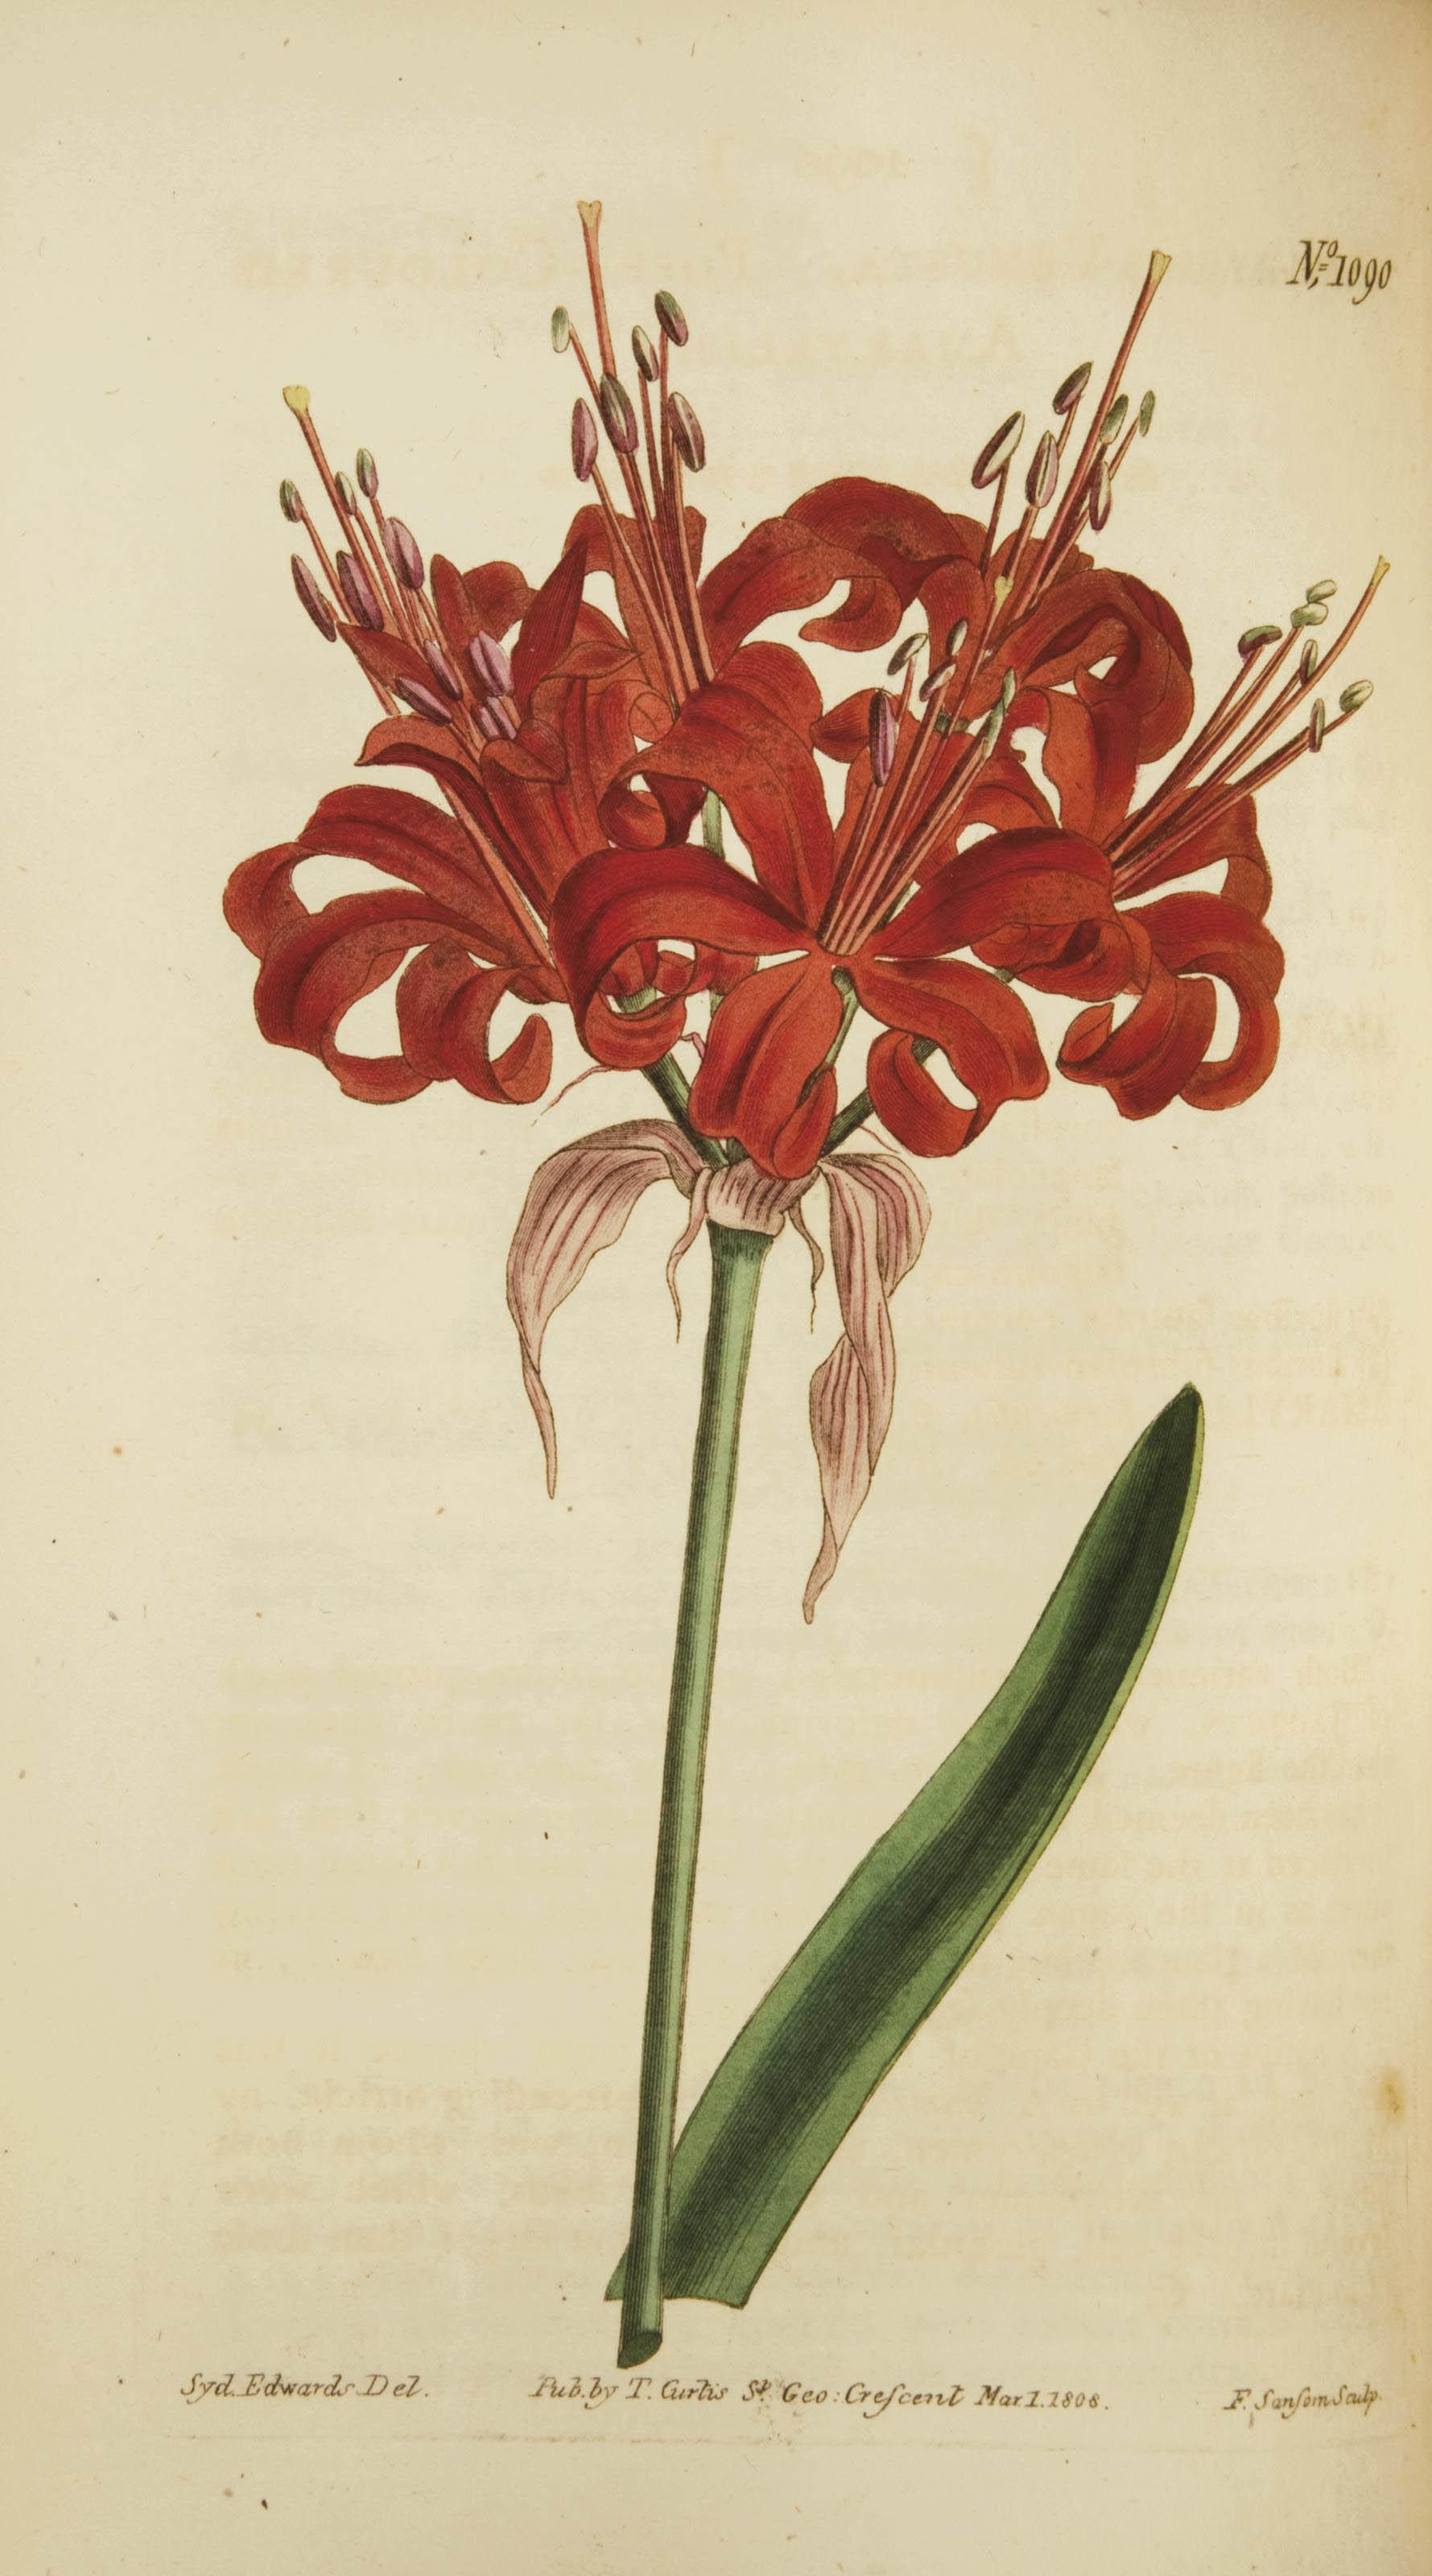 CURTIS, William (1746-1799). The Botanical Magazine; or, Flower-Garden Displayed. Londres: Stephen Couchman, 1793-1814.